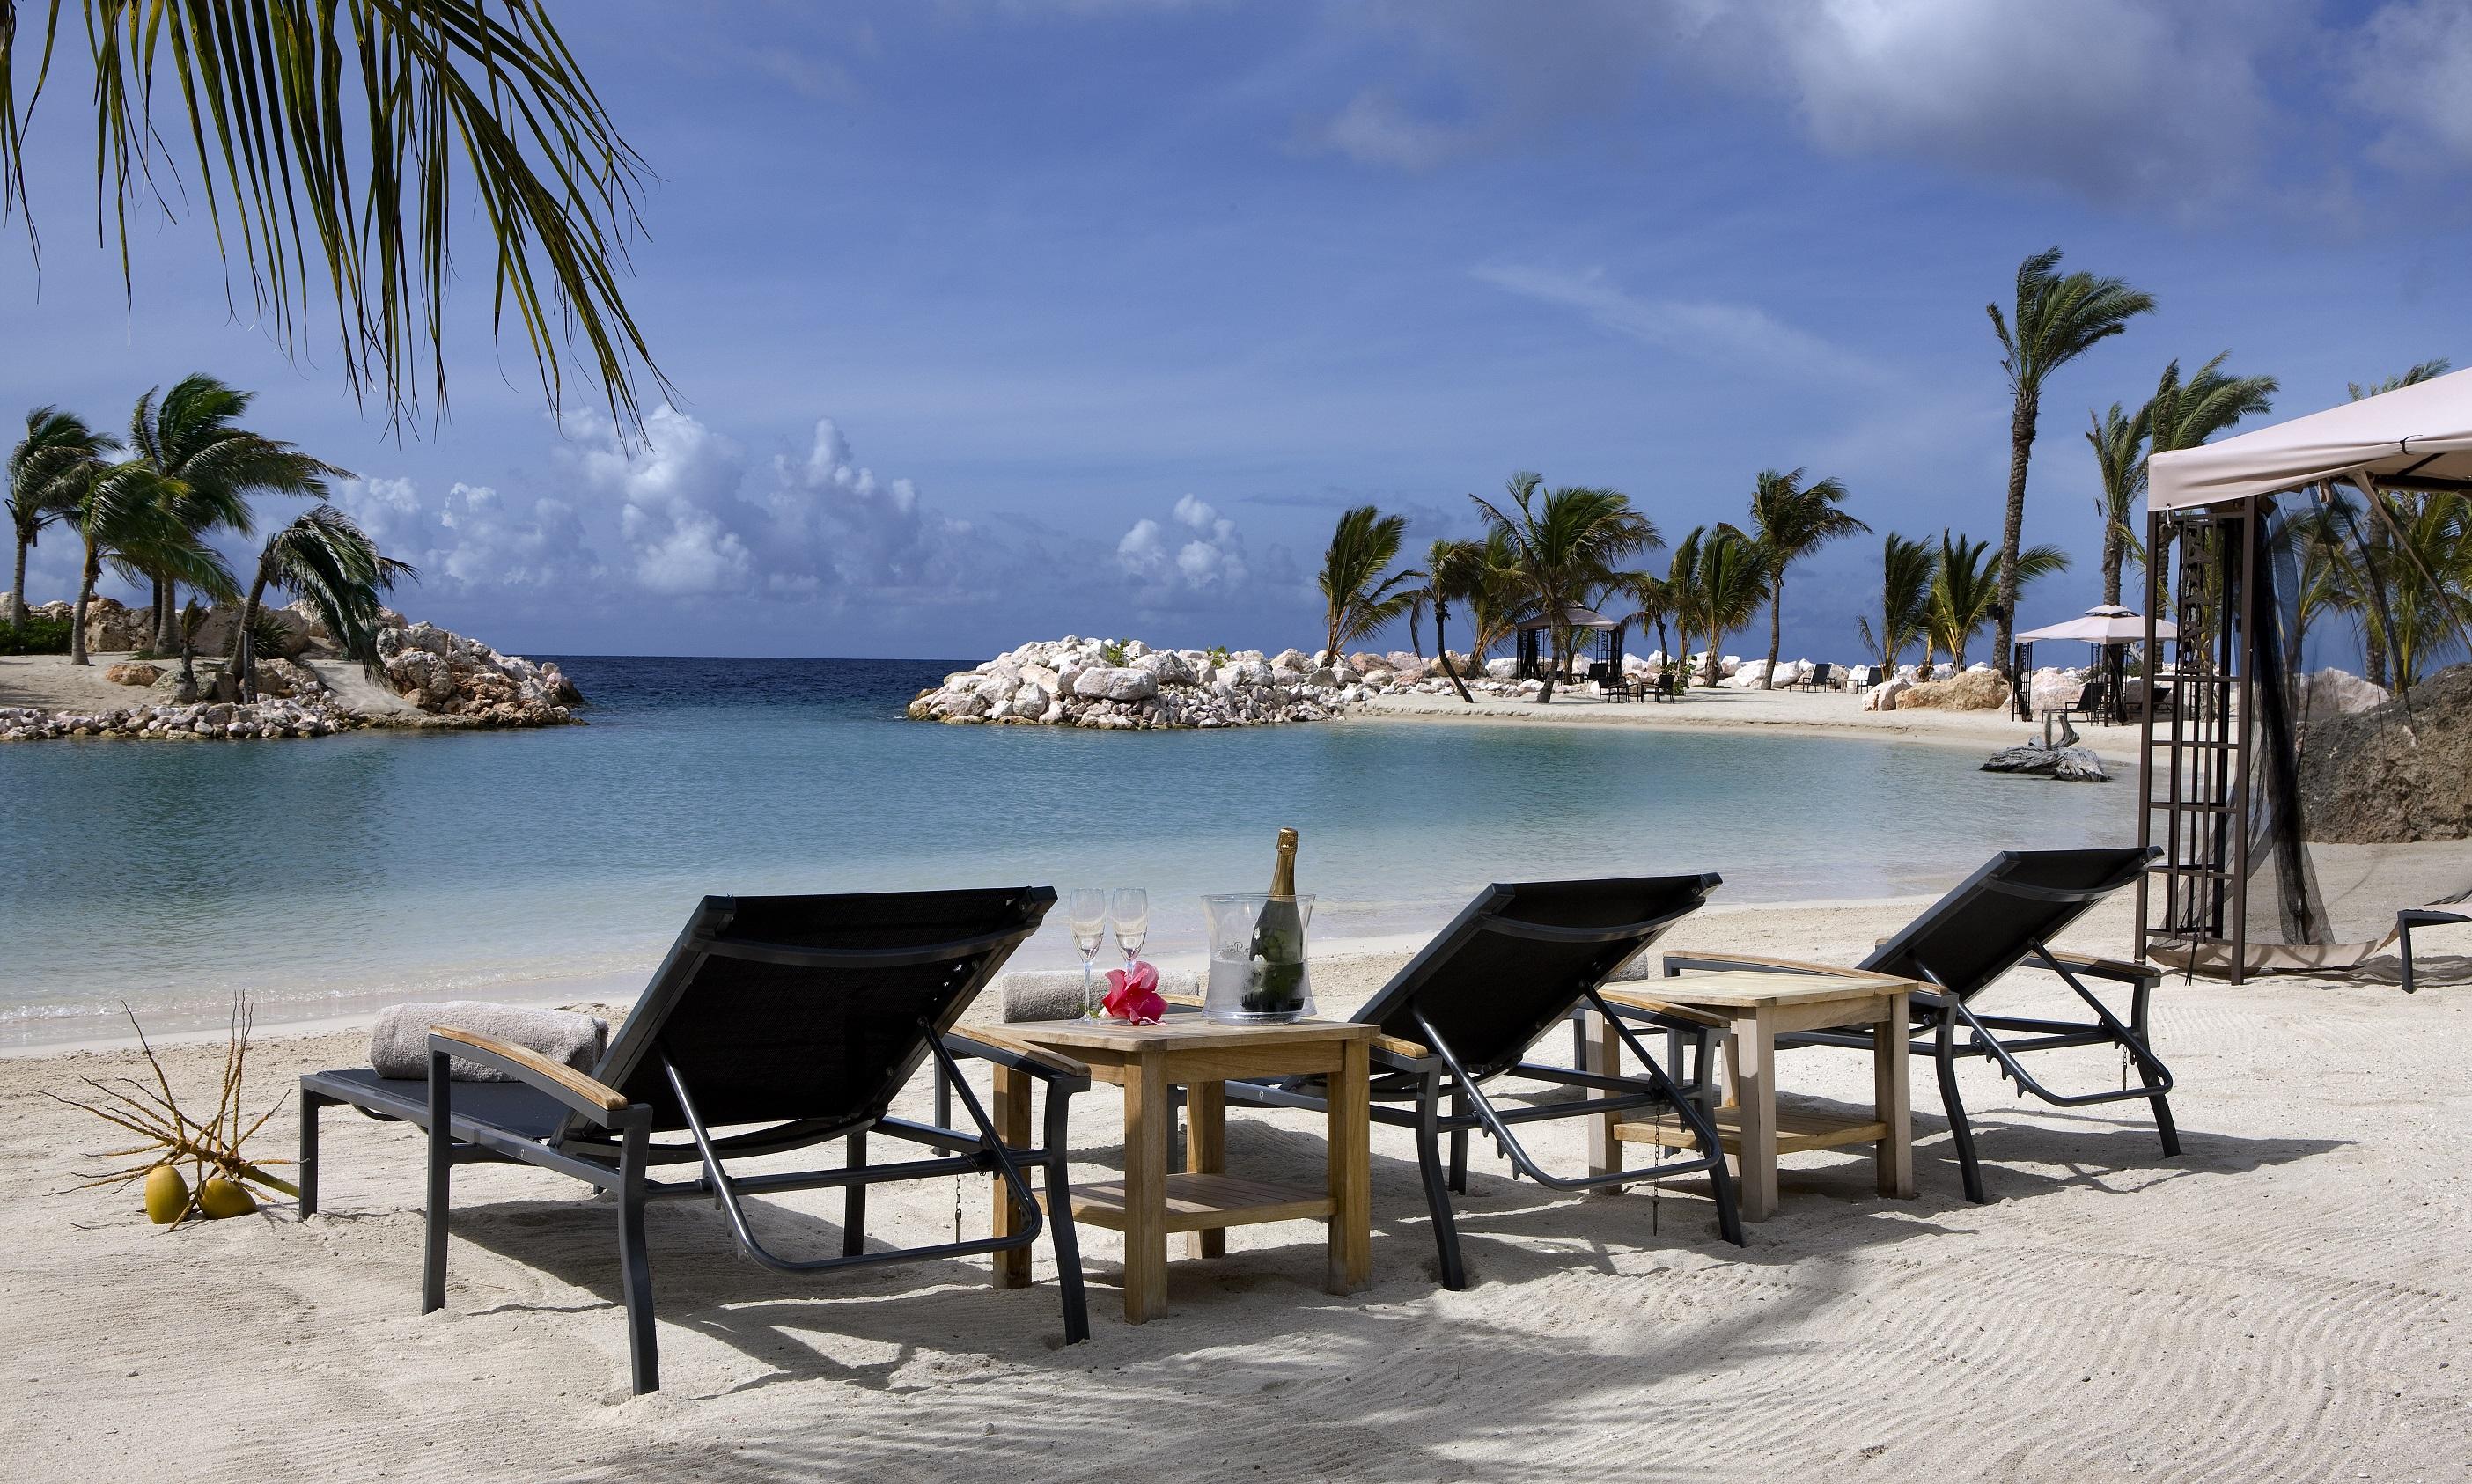 Beach Chairs and View of Lagoon.jpg